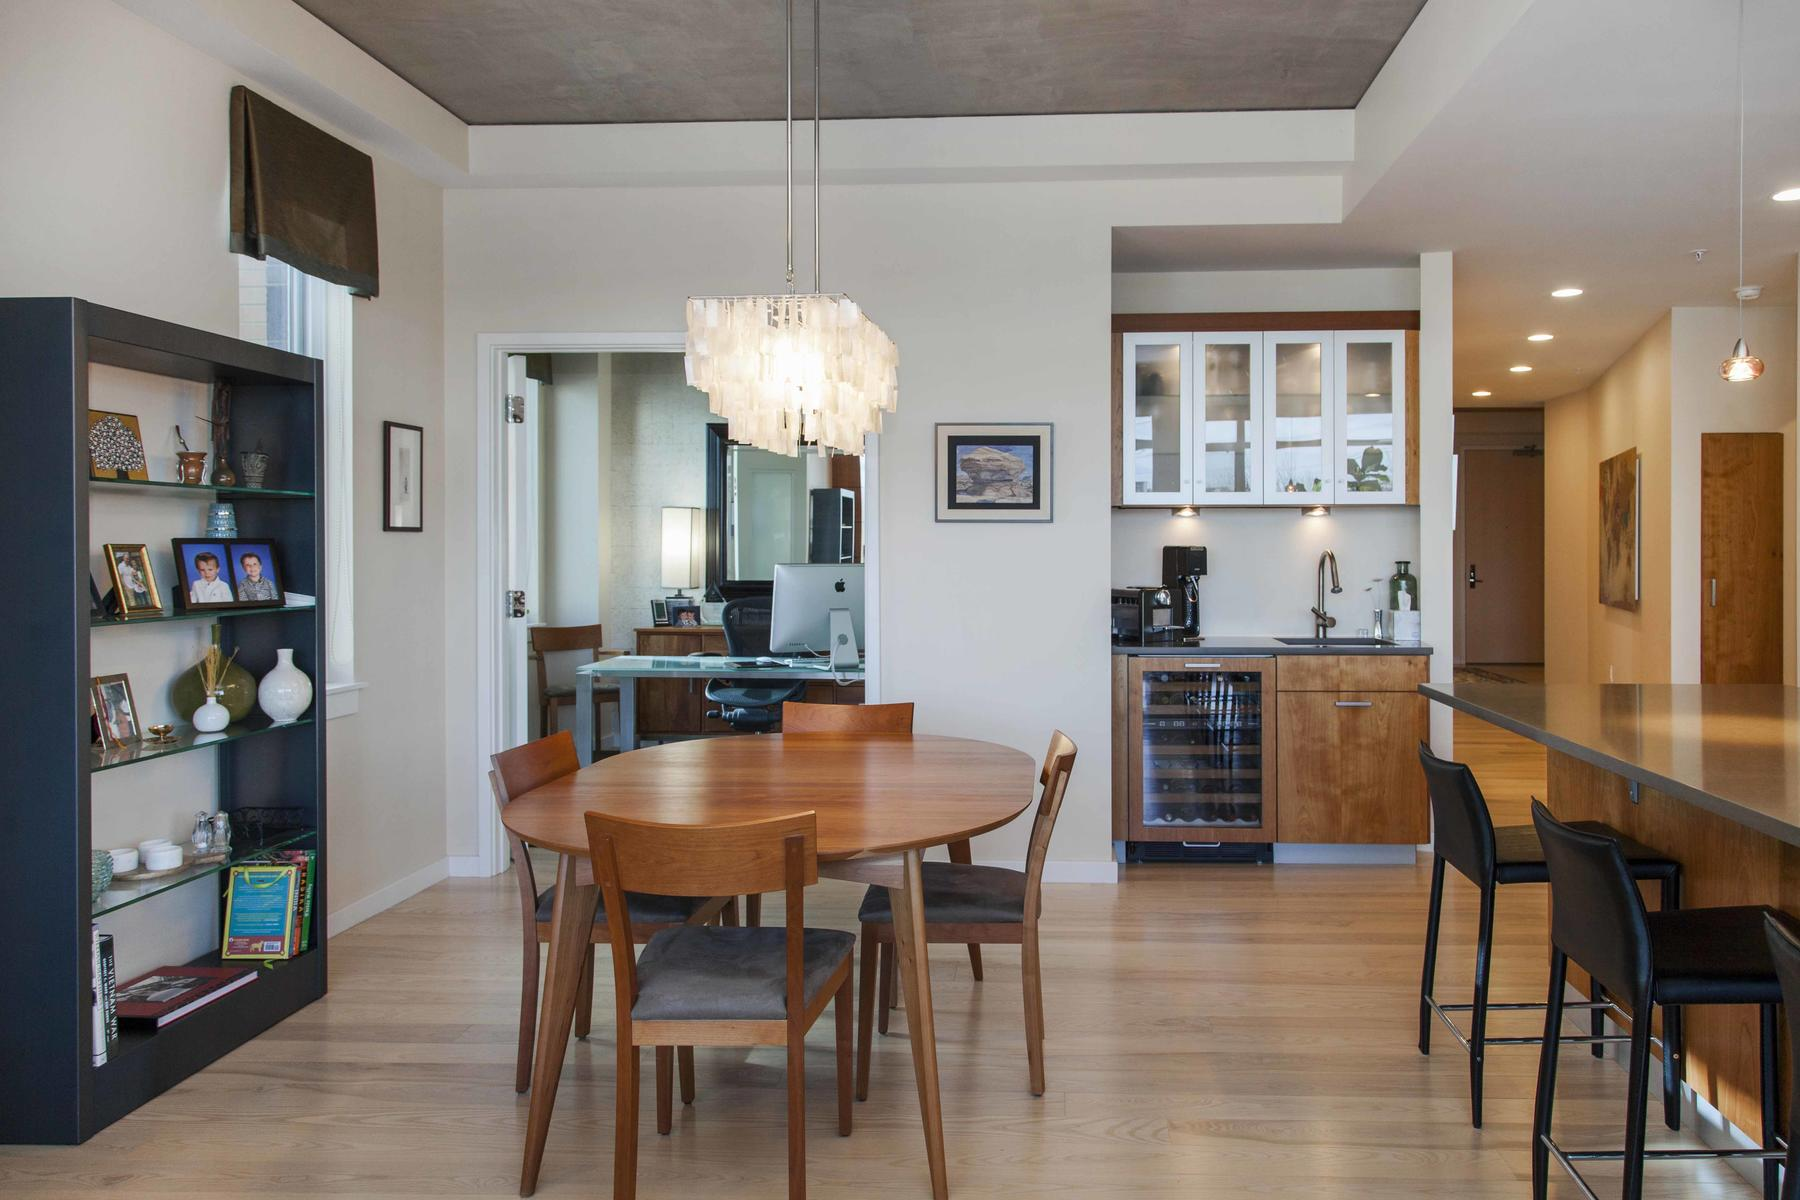 Additional photo for property listing at 1690 Bassett Street #16 1690 Bassett Street #16 Denver, Colorado 80202 United States